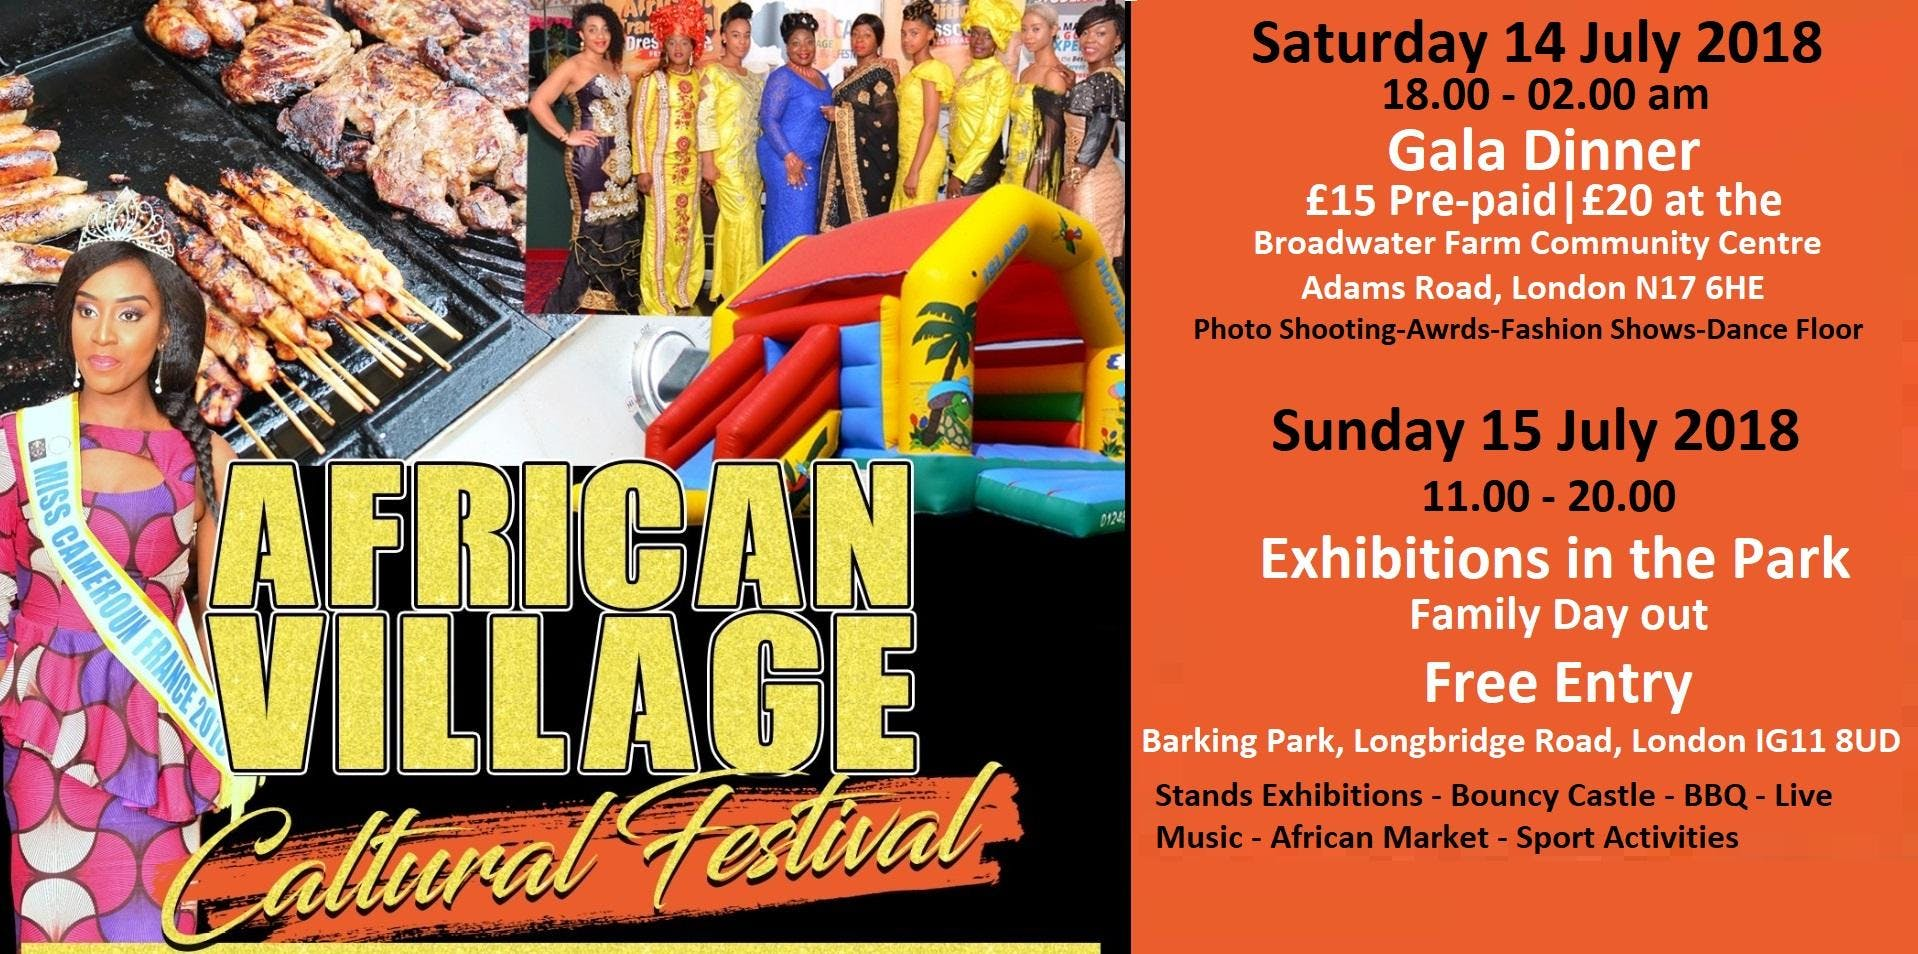 AFRICAN VILLAGE CULTURAL FESTIVAL LONDON 2018